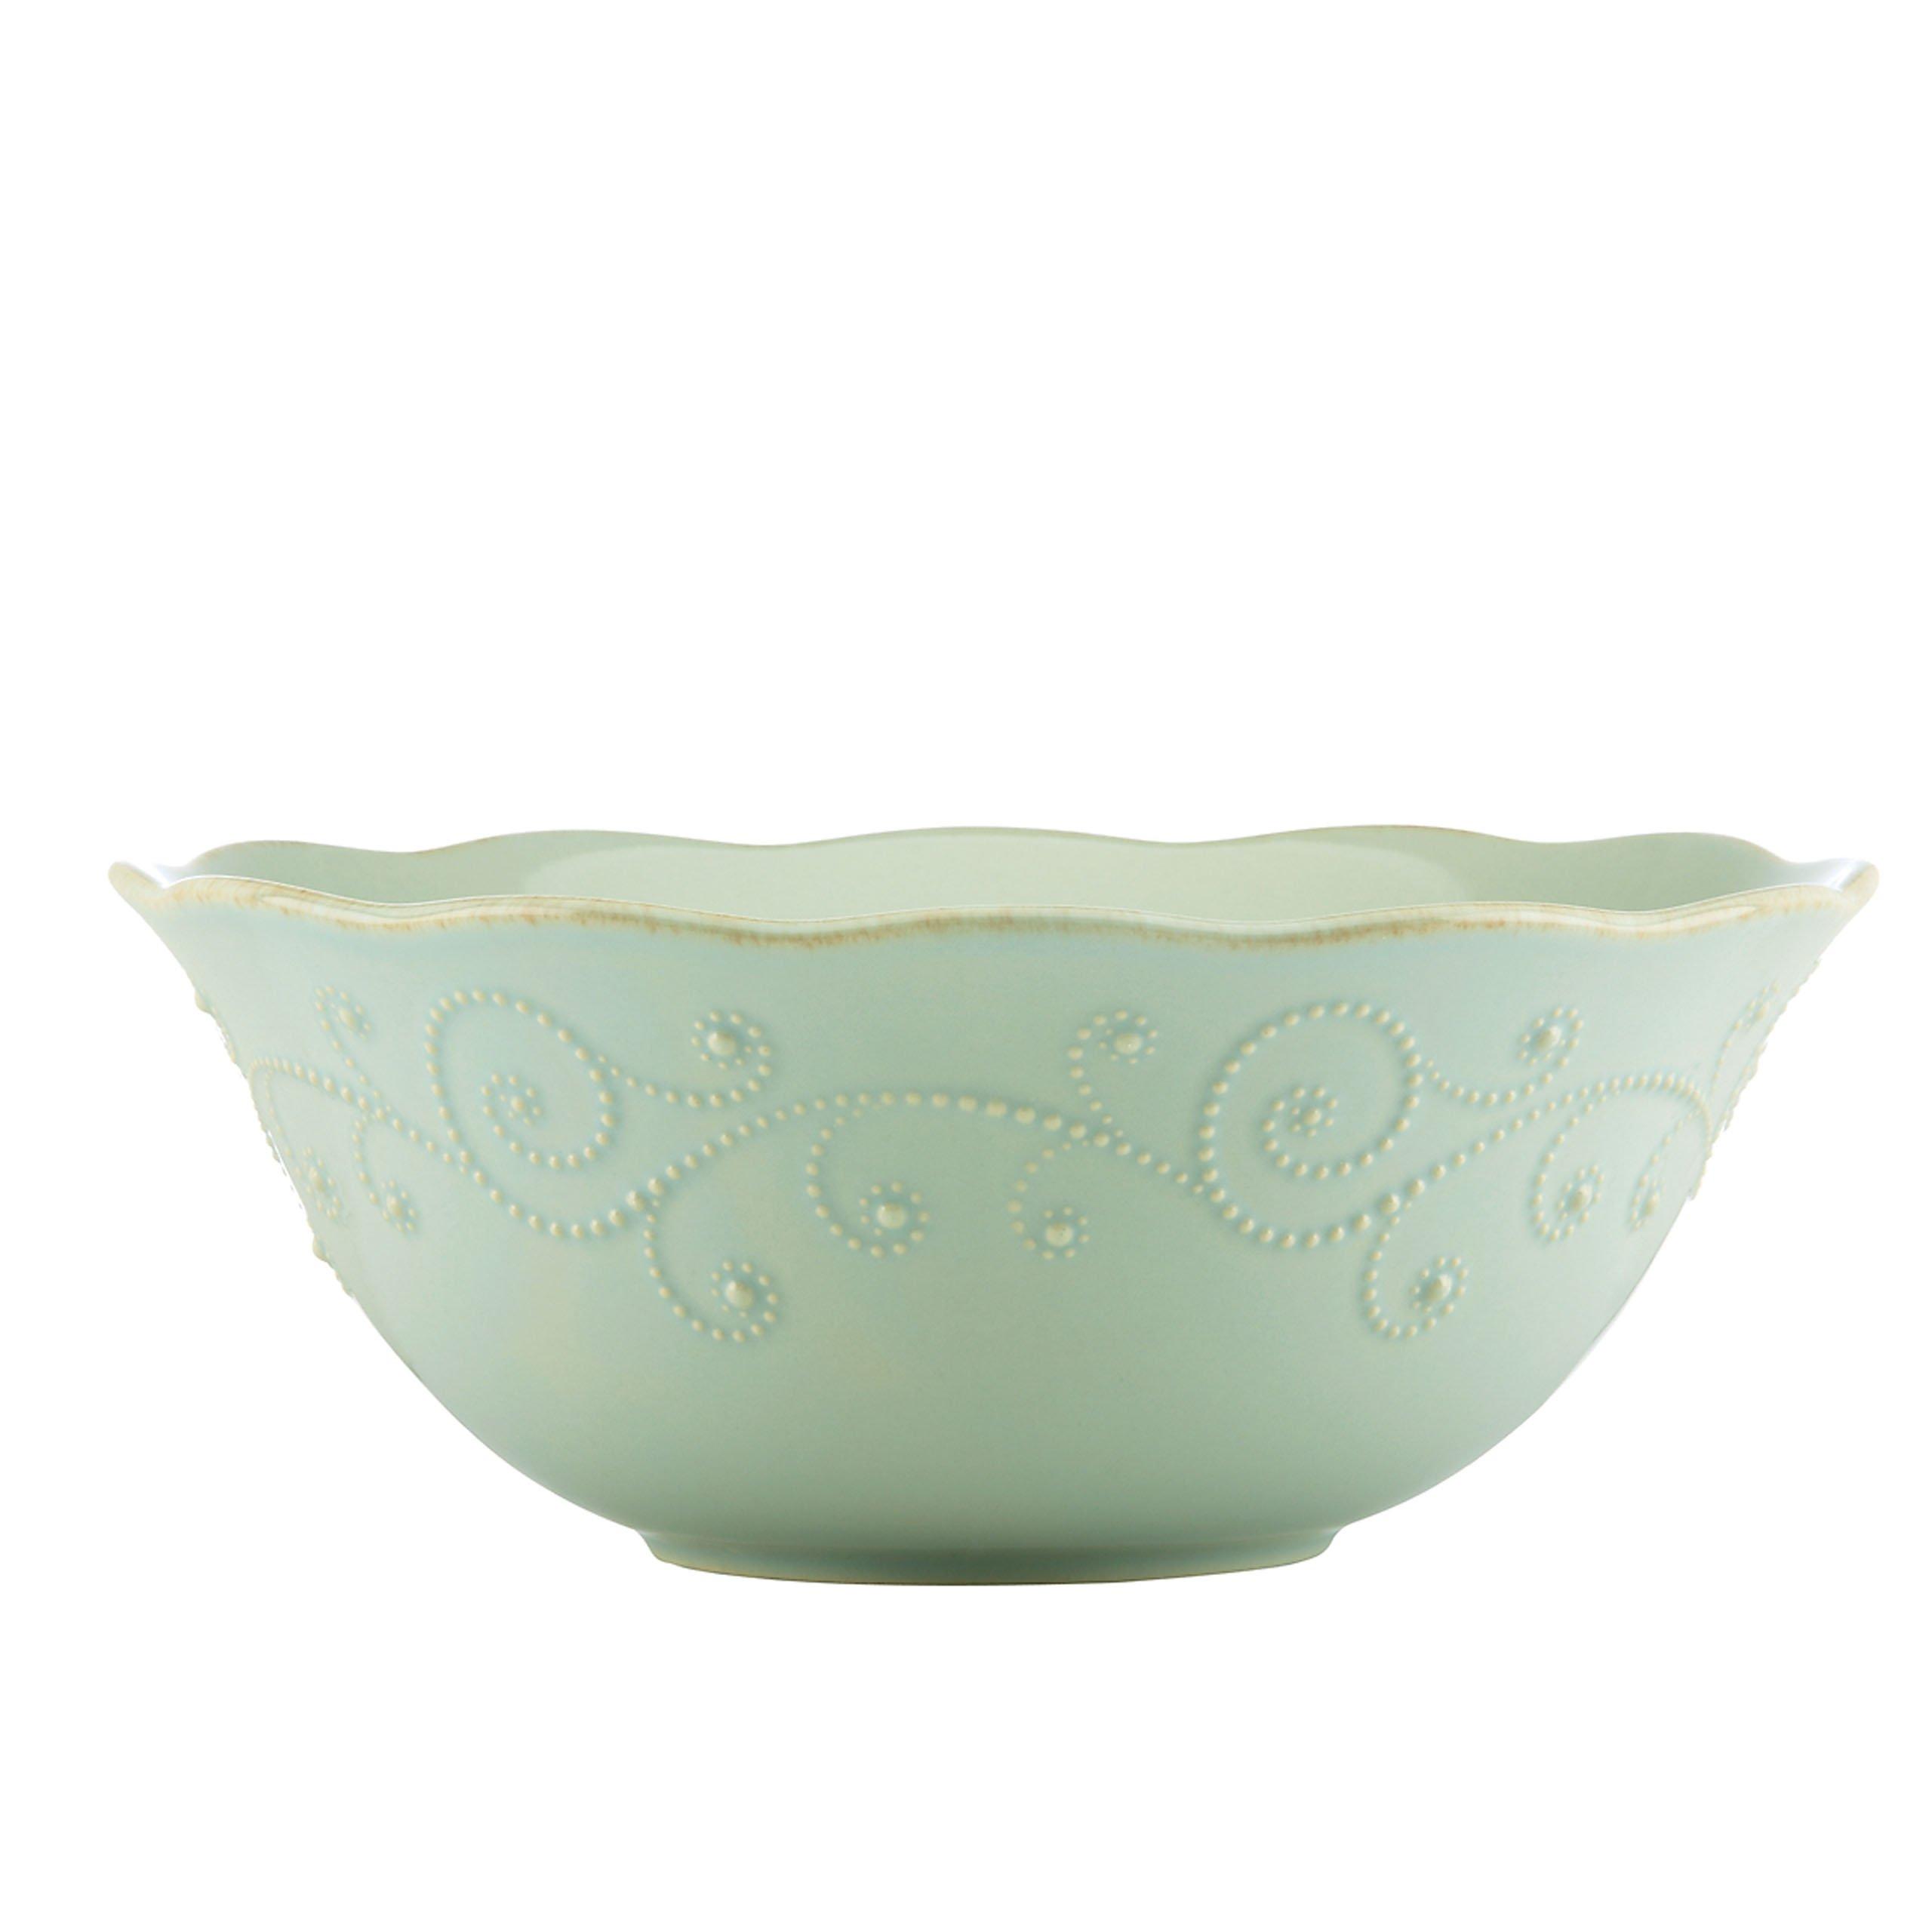 Lenox French Perle Serve Bowl, Ice Blue